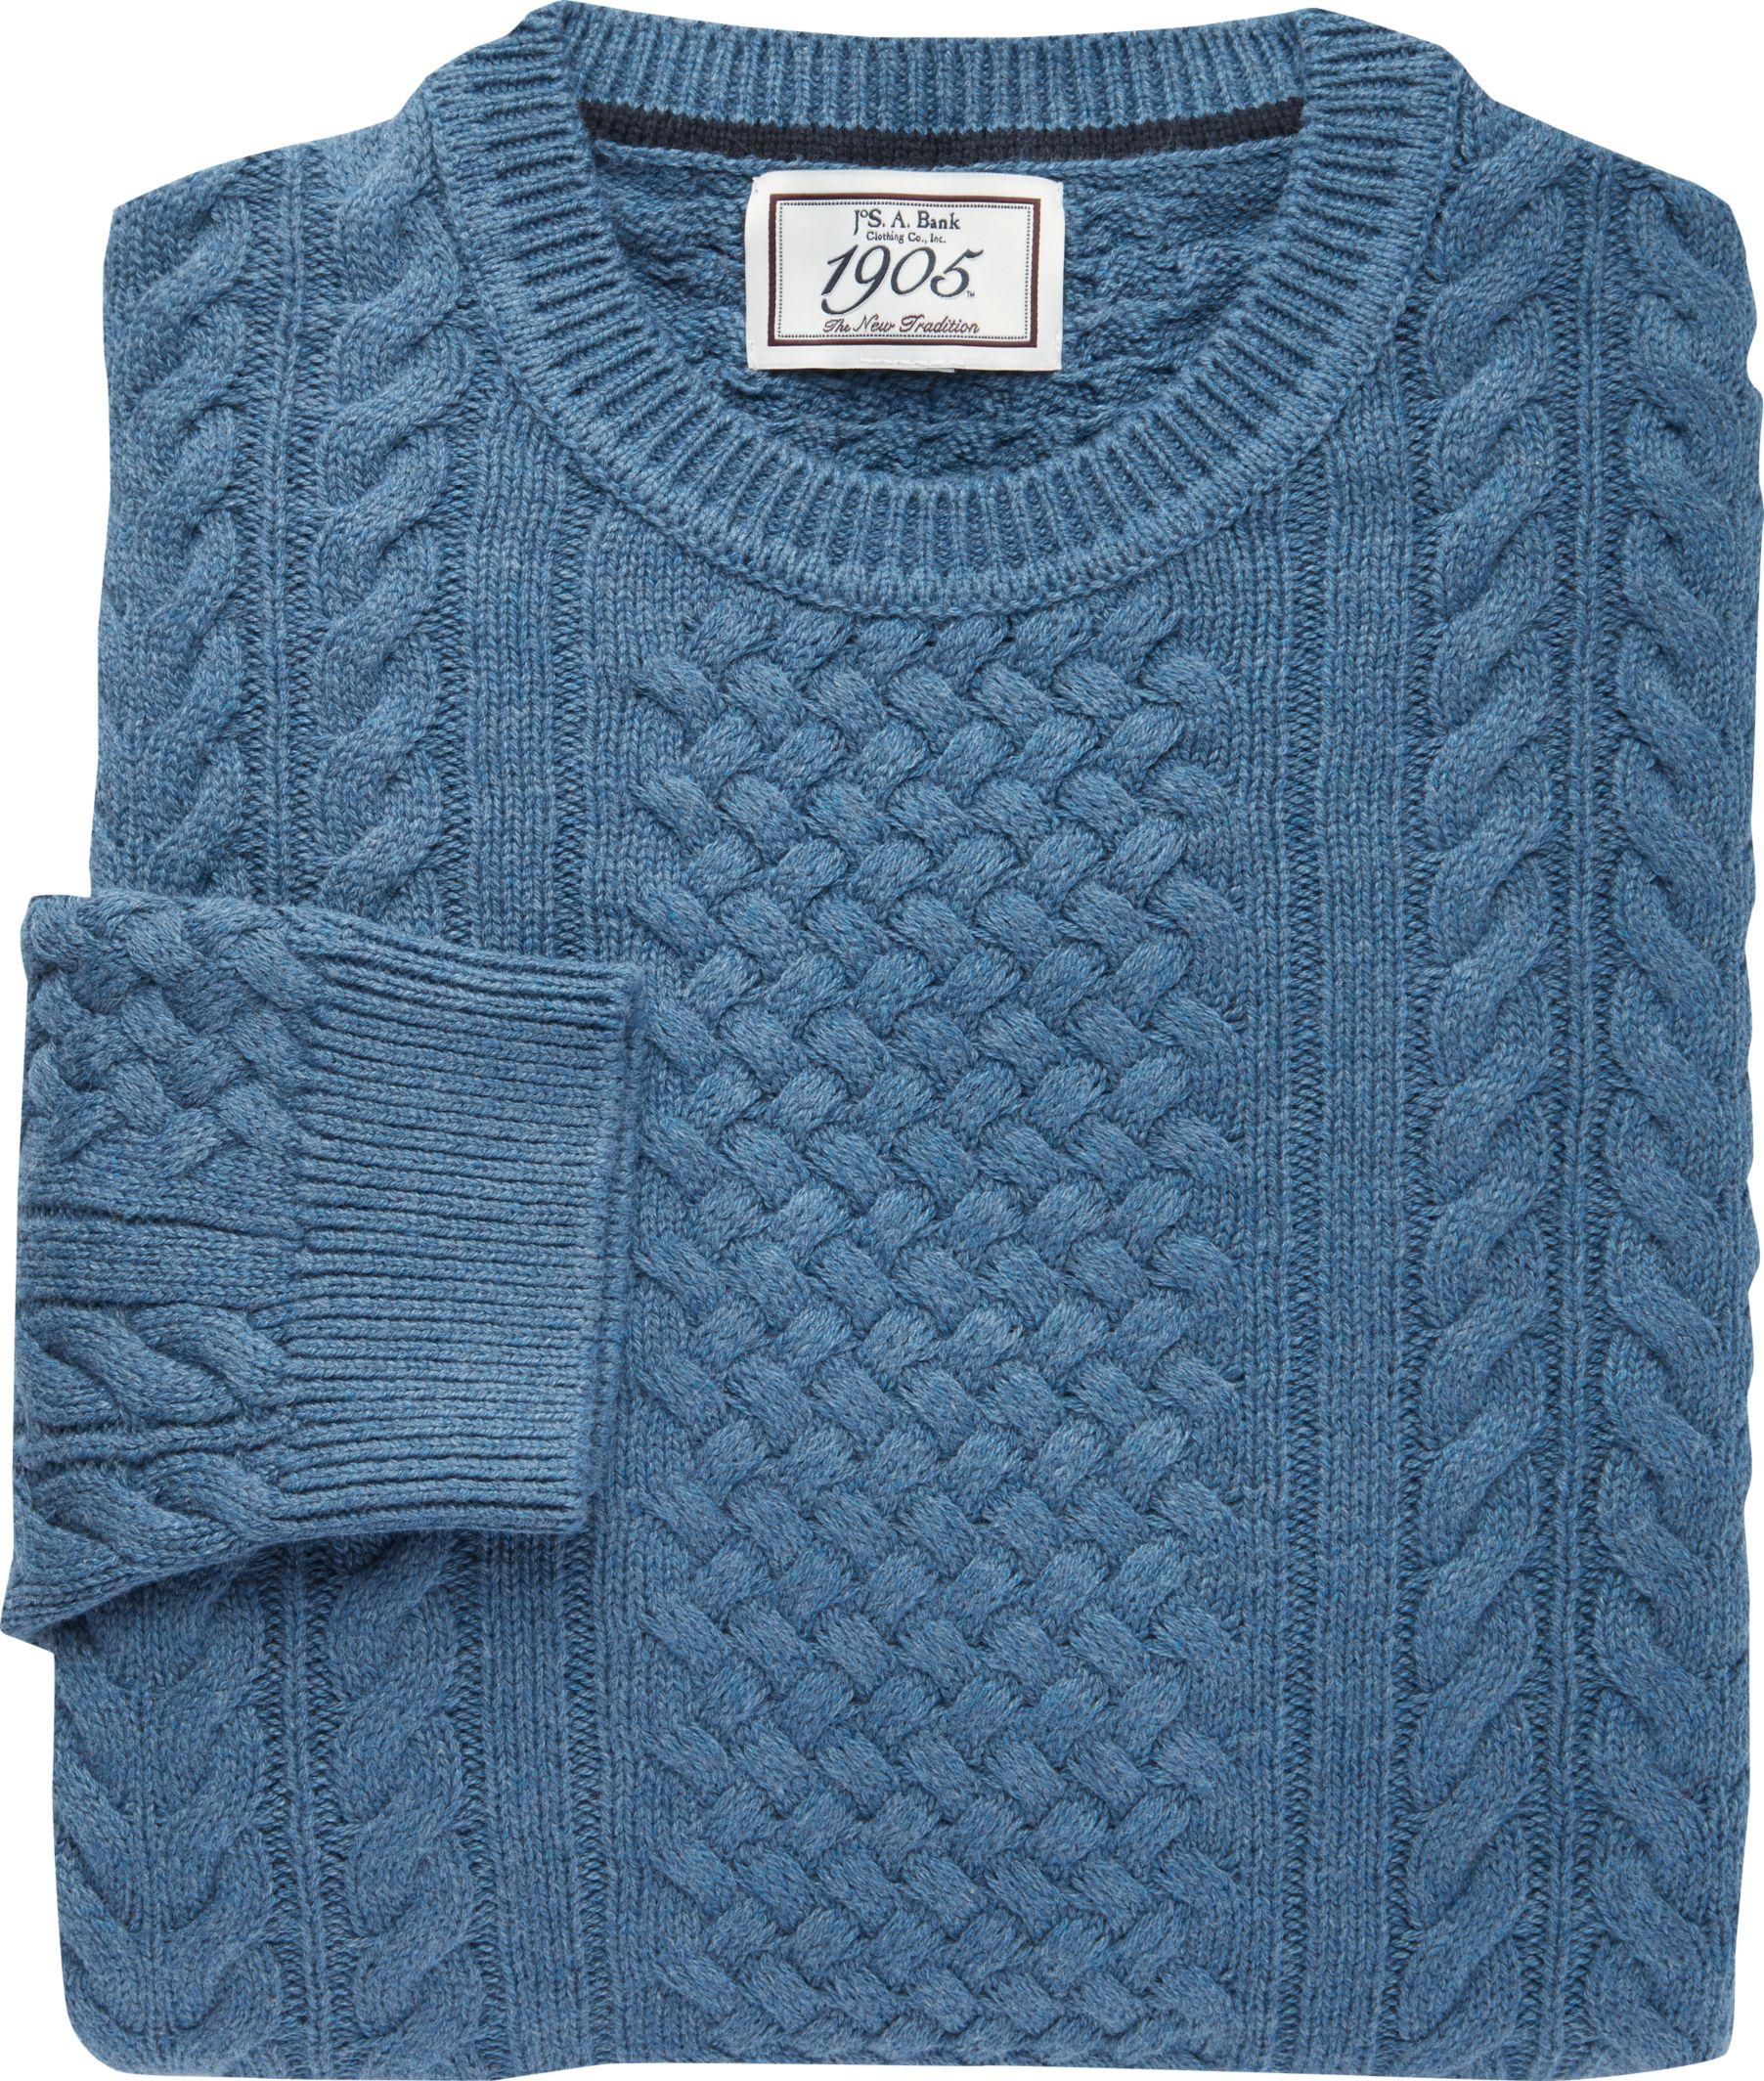 d247de13c9 1905 Collection Cotton Cable-Knit Sweater CLEARANCE -  29 Pima ...